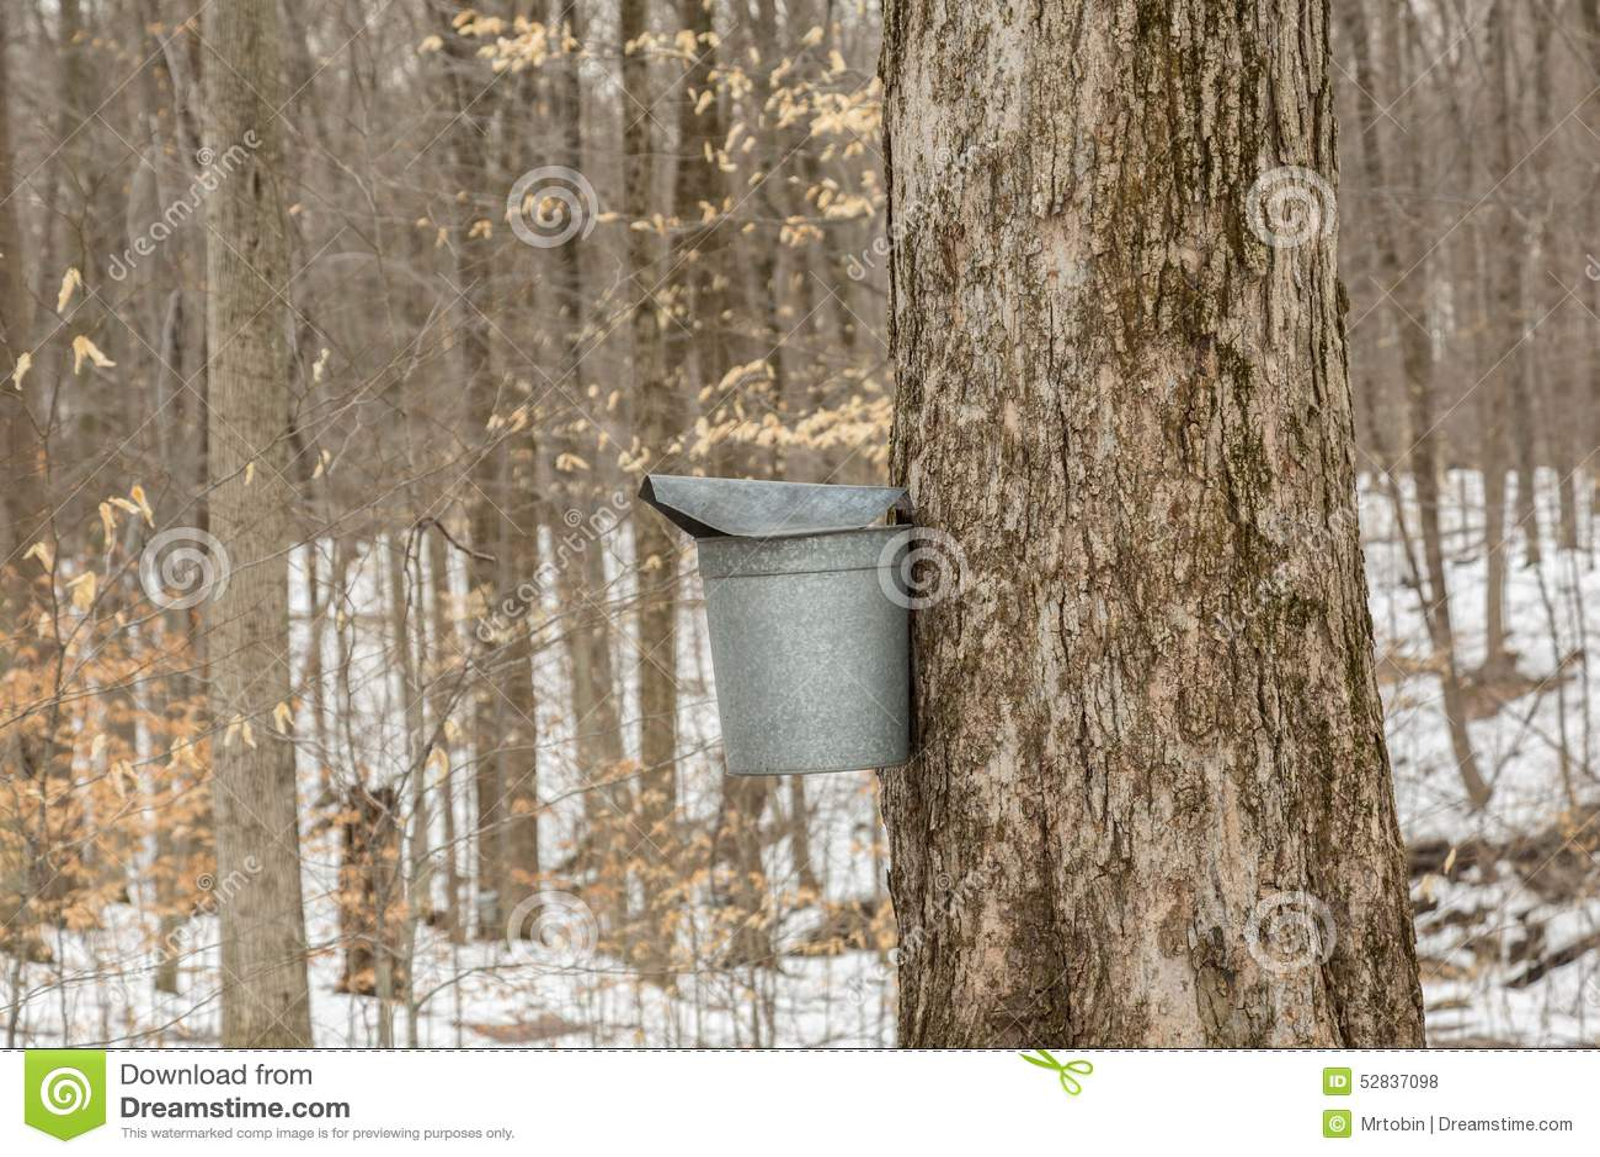 Maple Sugaring Season